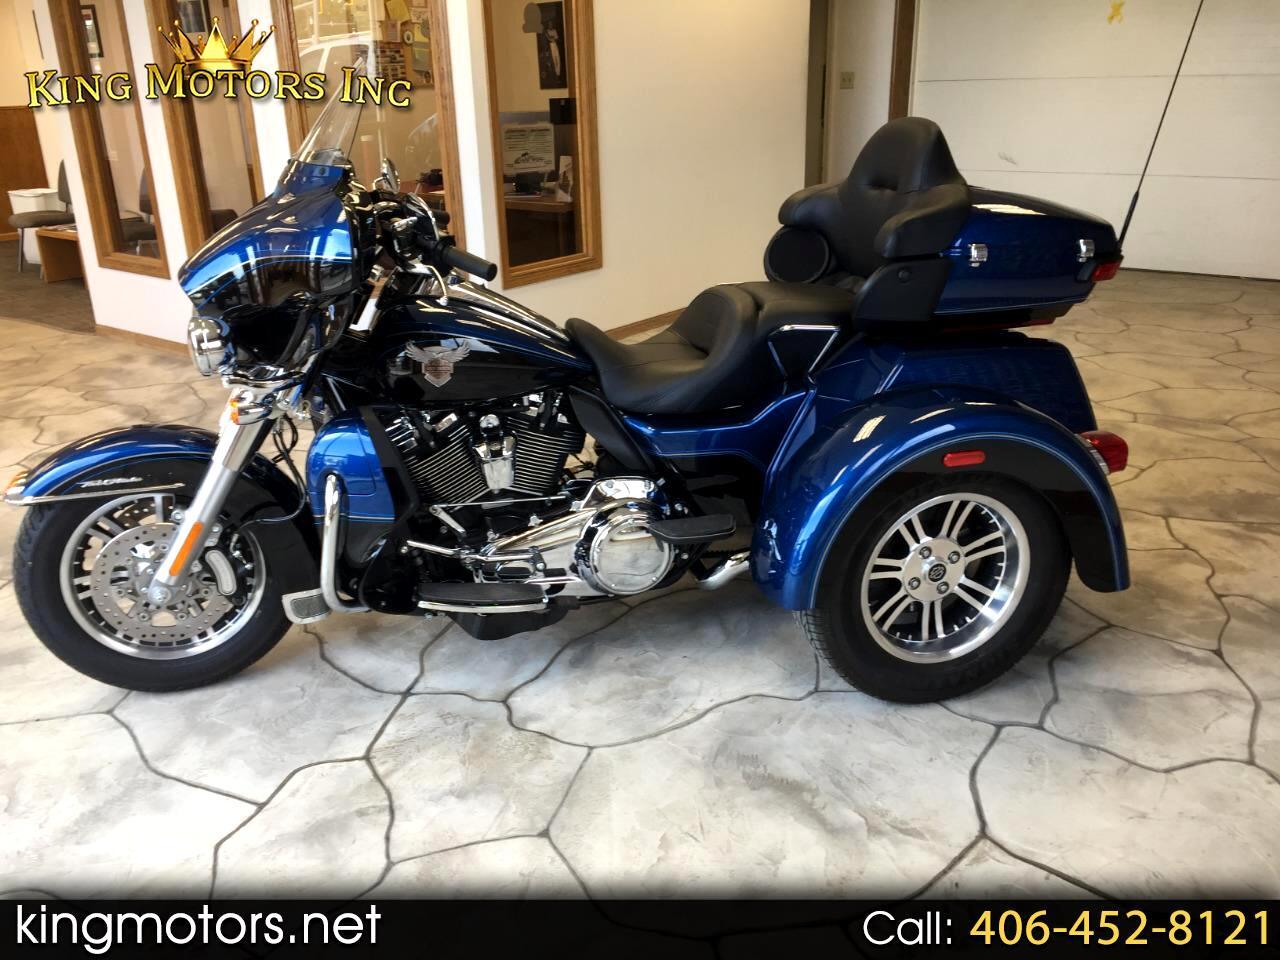 2018 Harley-Davidson Trike 115 YR. ANNIVERSARY EDITION